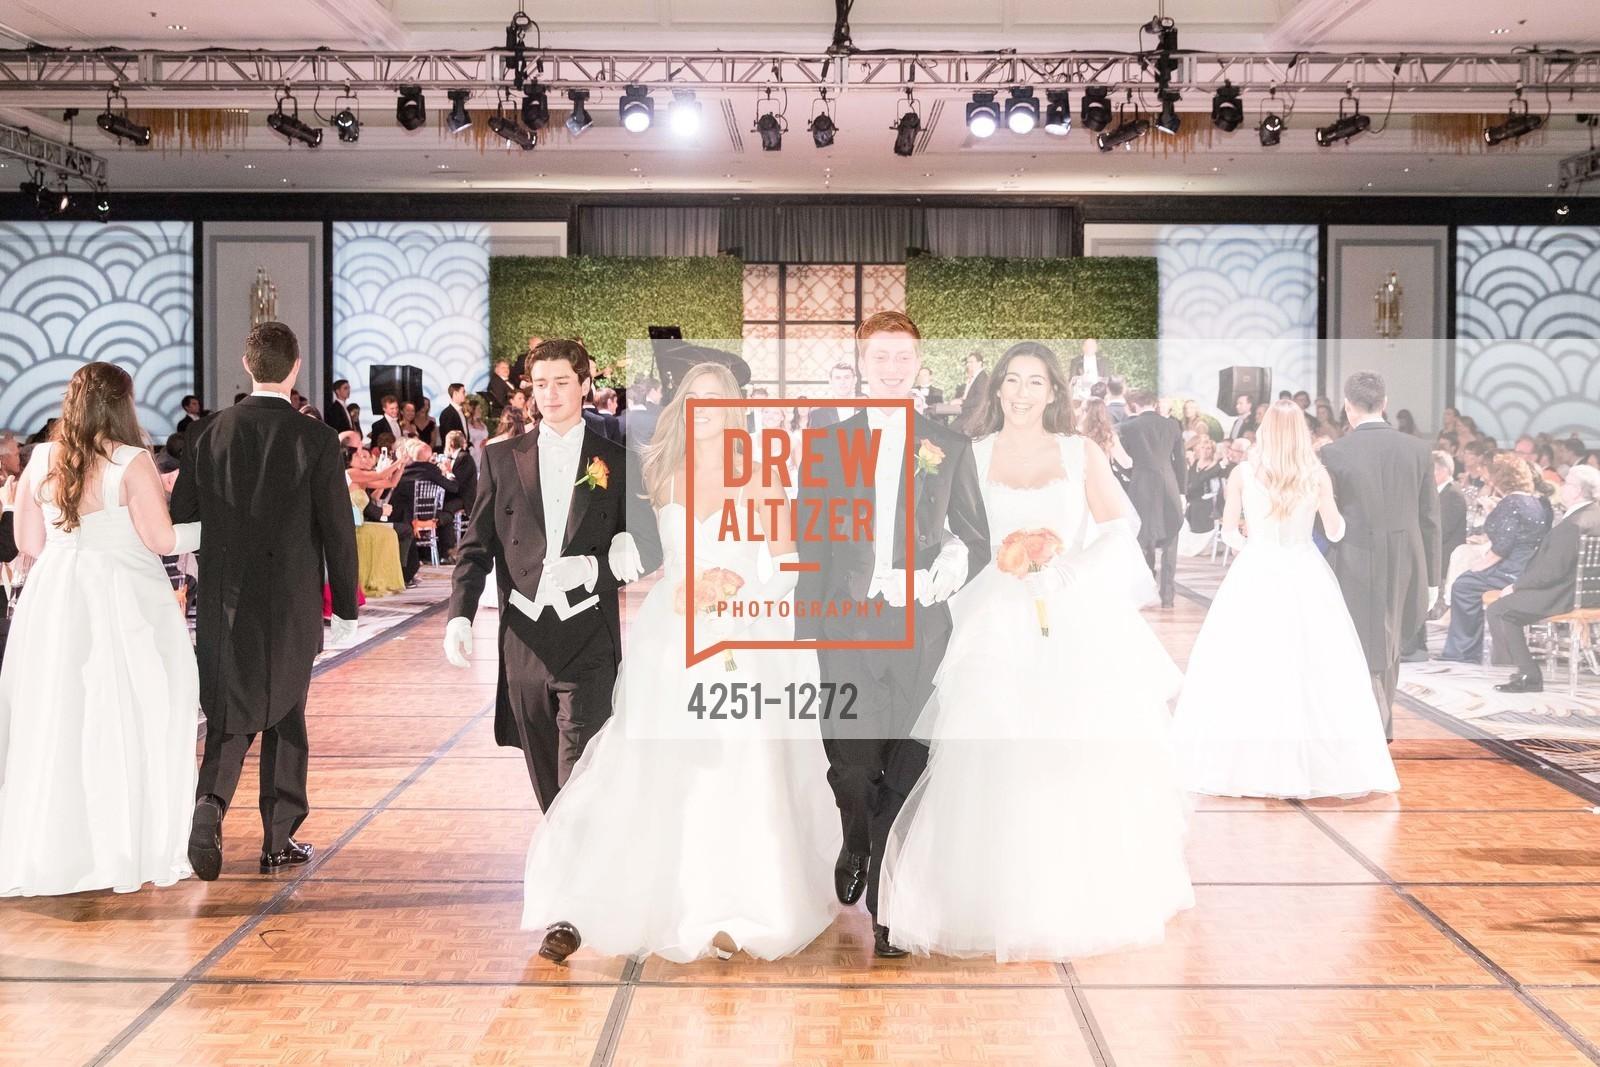 Finlay McInerney, Kaitlyn Christine Fitzsimmons, Alexander Evers, Katarina Evers, Photo #4251-1272